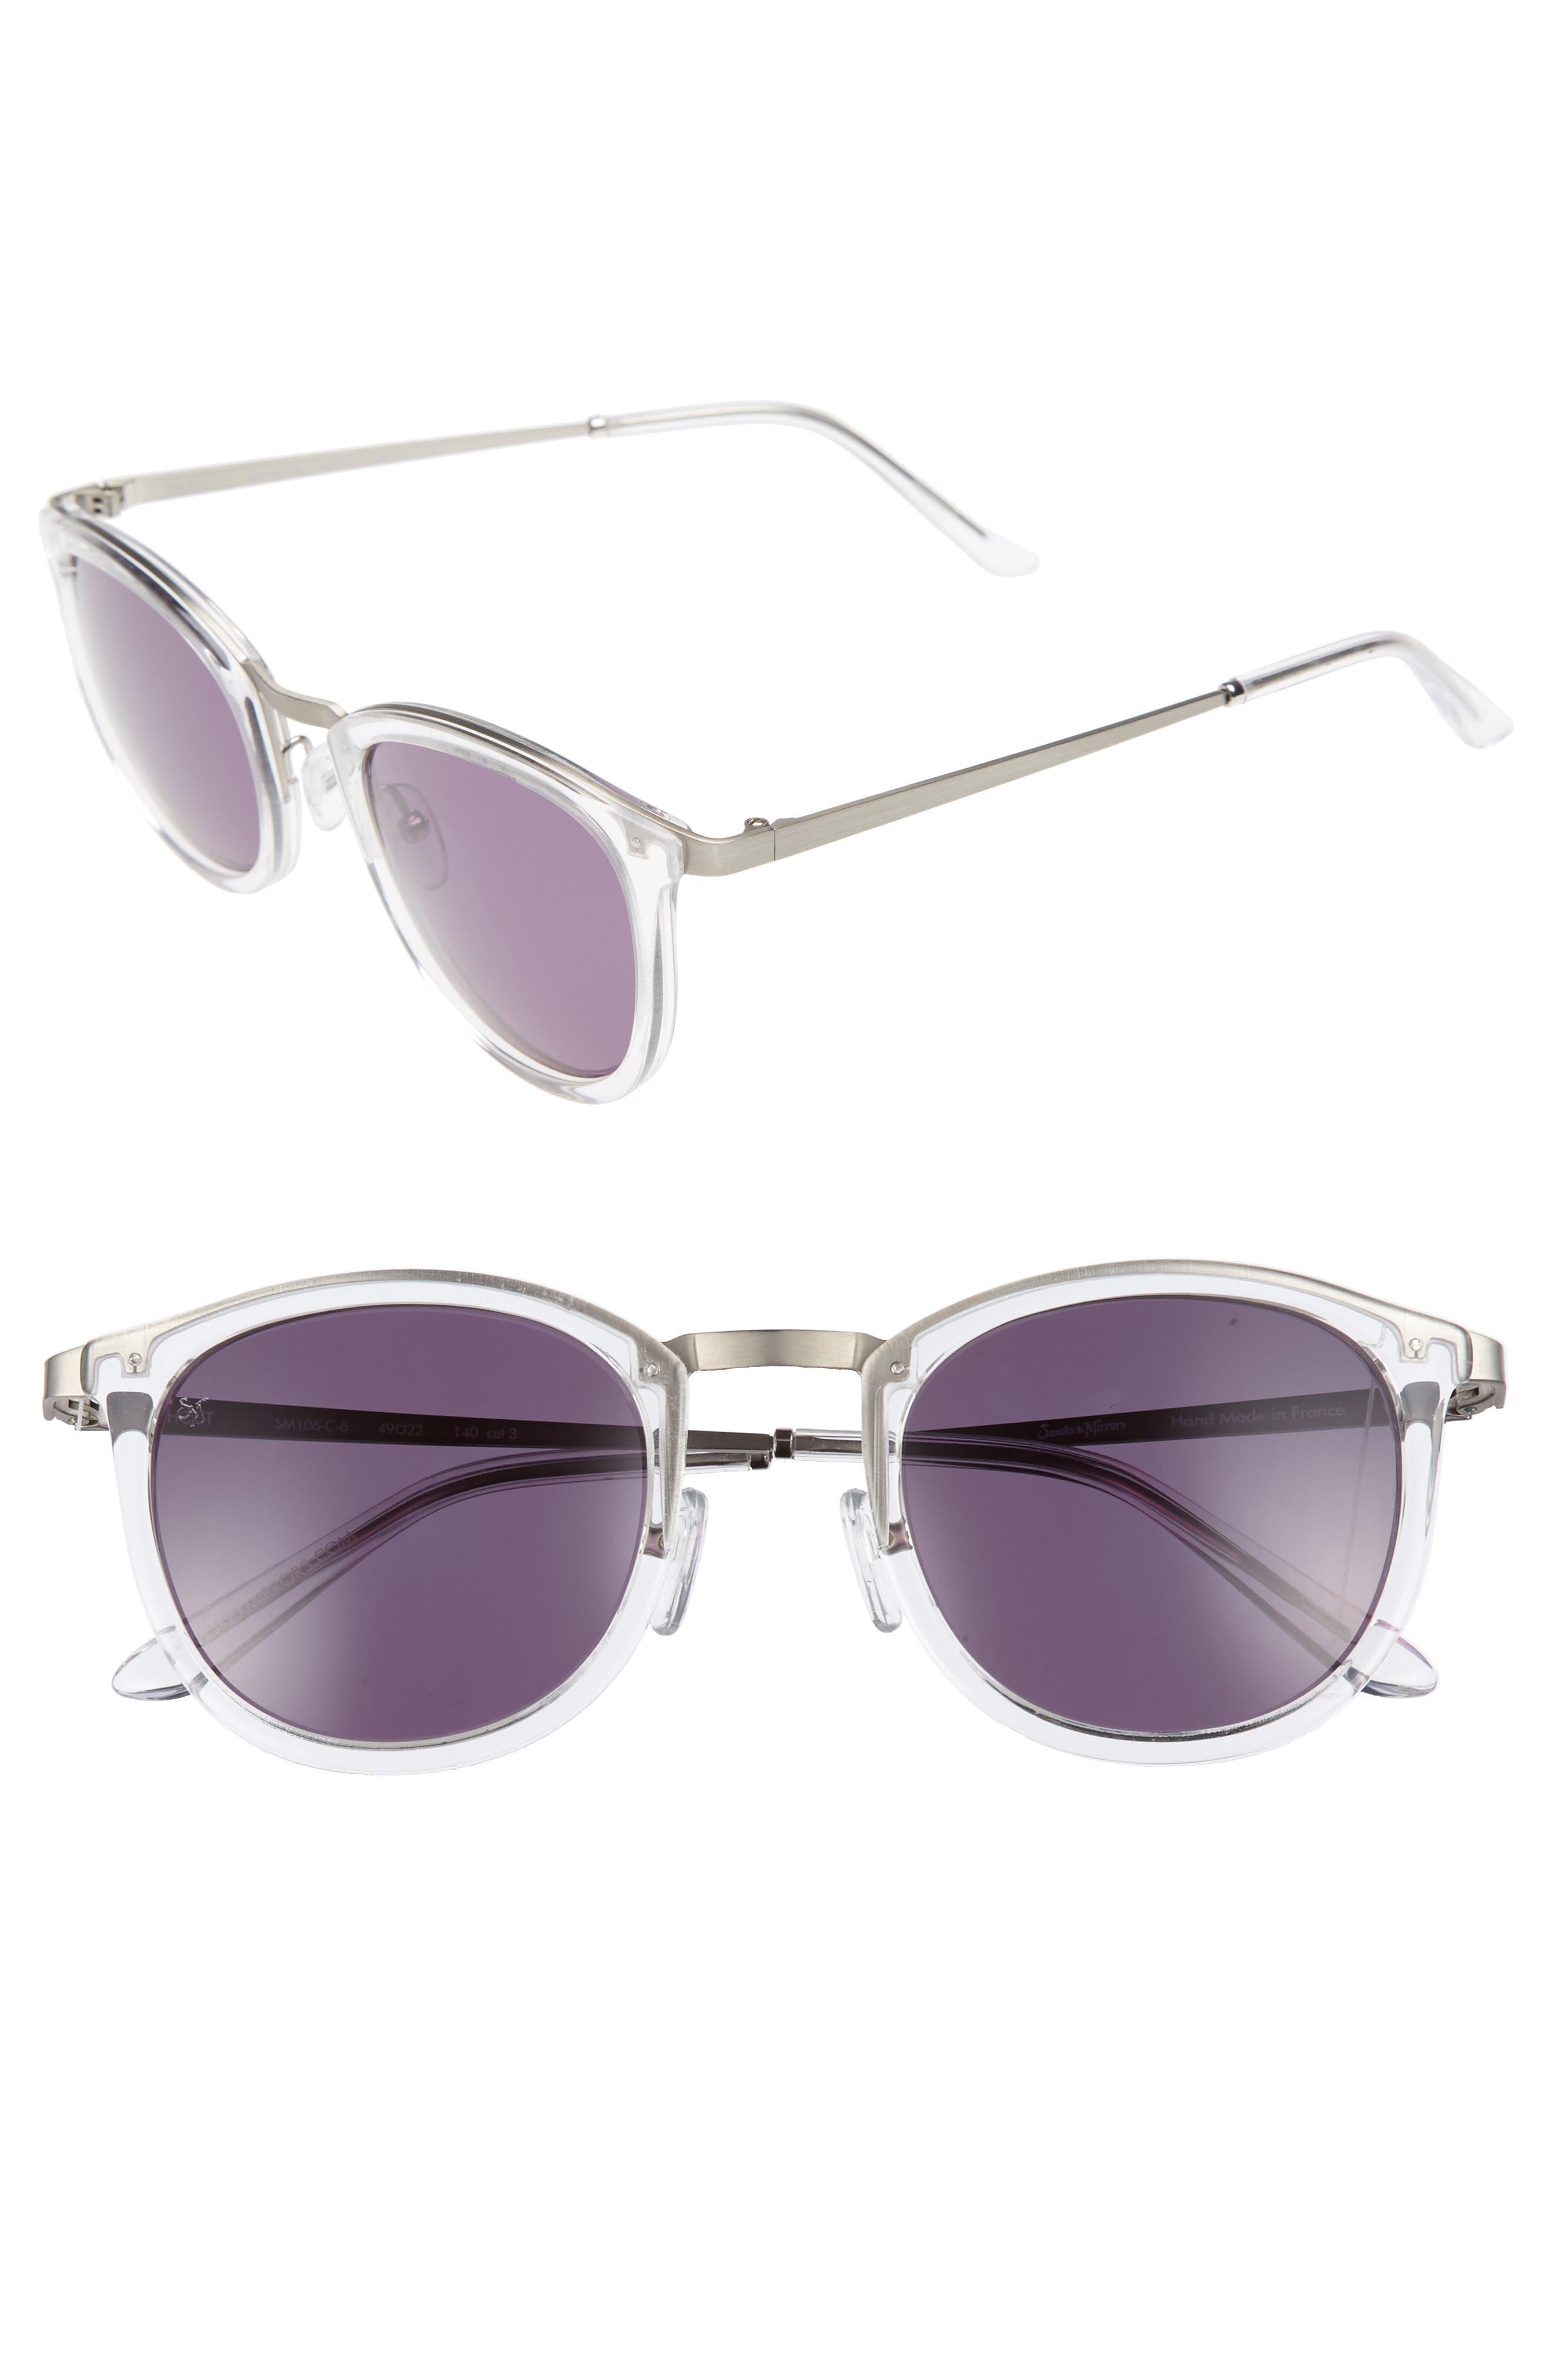 SMOKE X MIRRORS Shout 49mm Retro Sunglasses